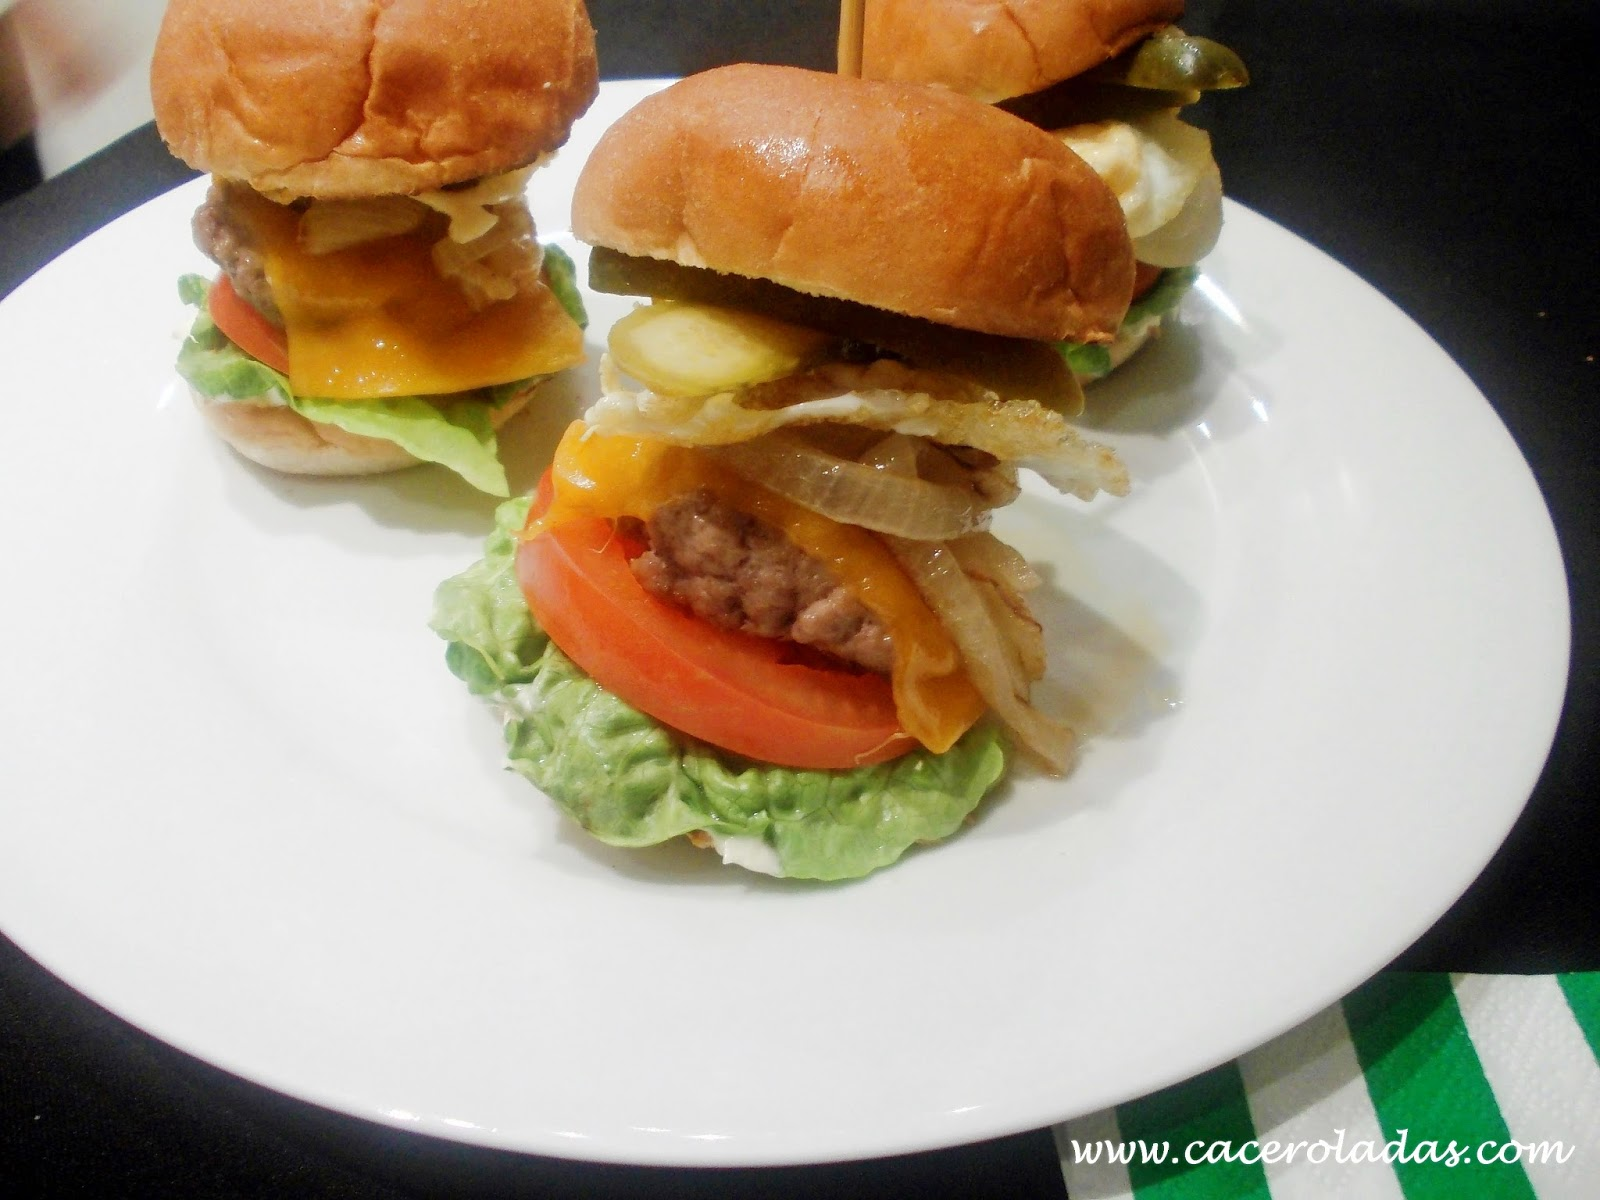 Hamburguesas (mini) de carne de buey